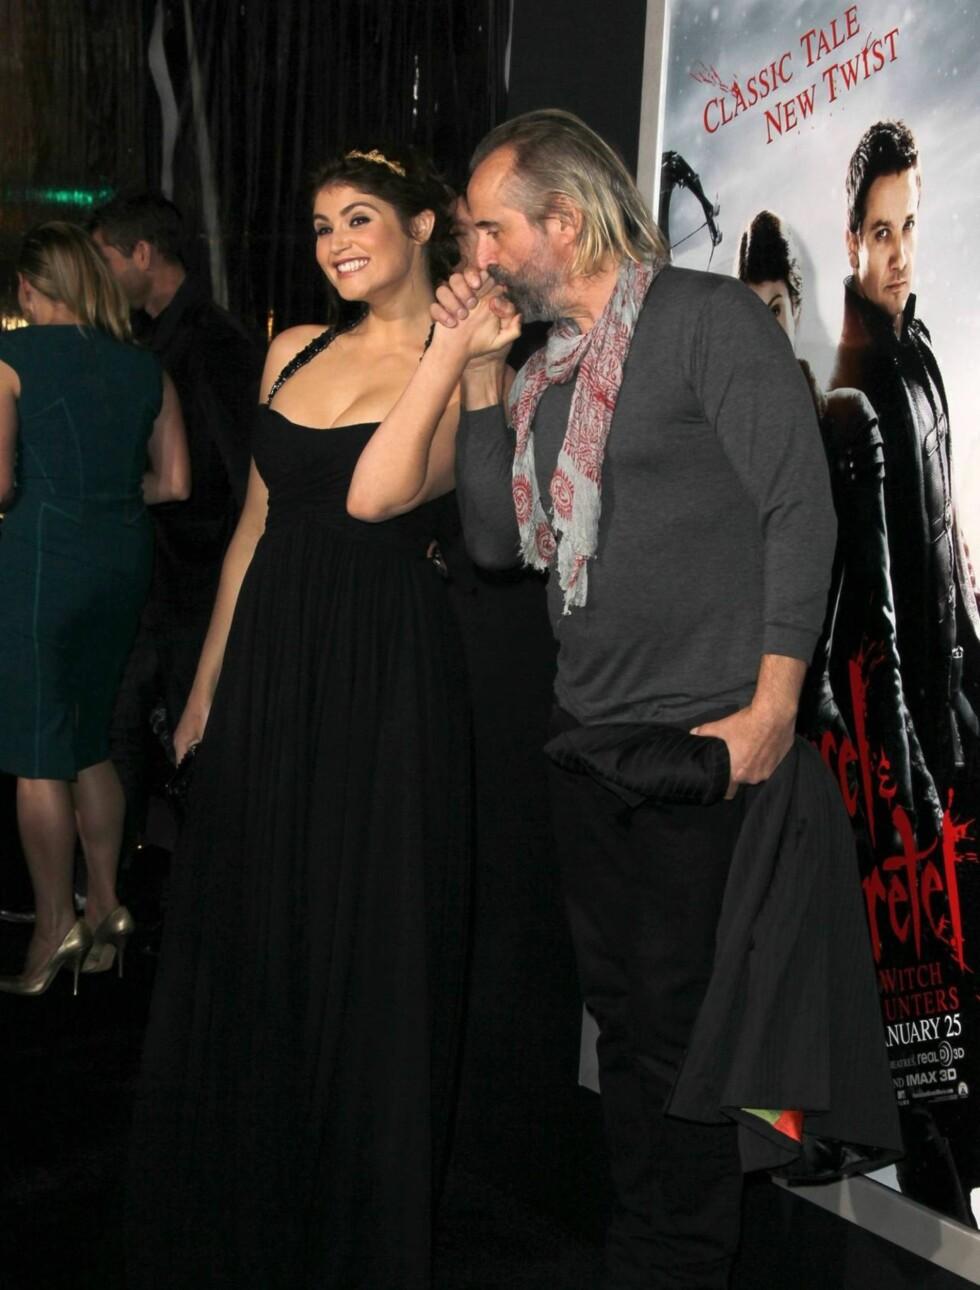 KOSETE: Peter Stormare kysset sin vakre skuespillerkollega både her og der. Foto: All Over Press